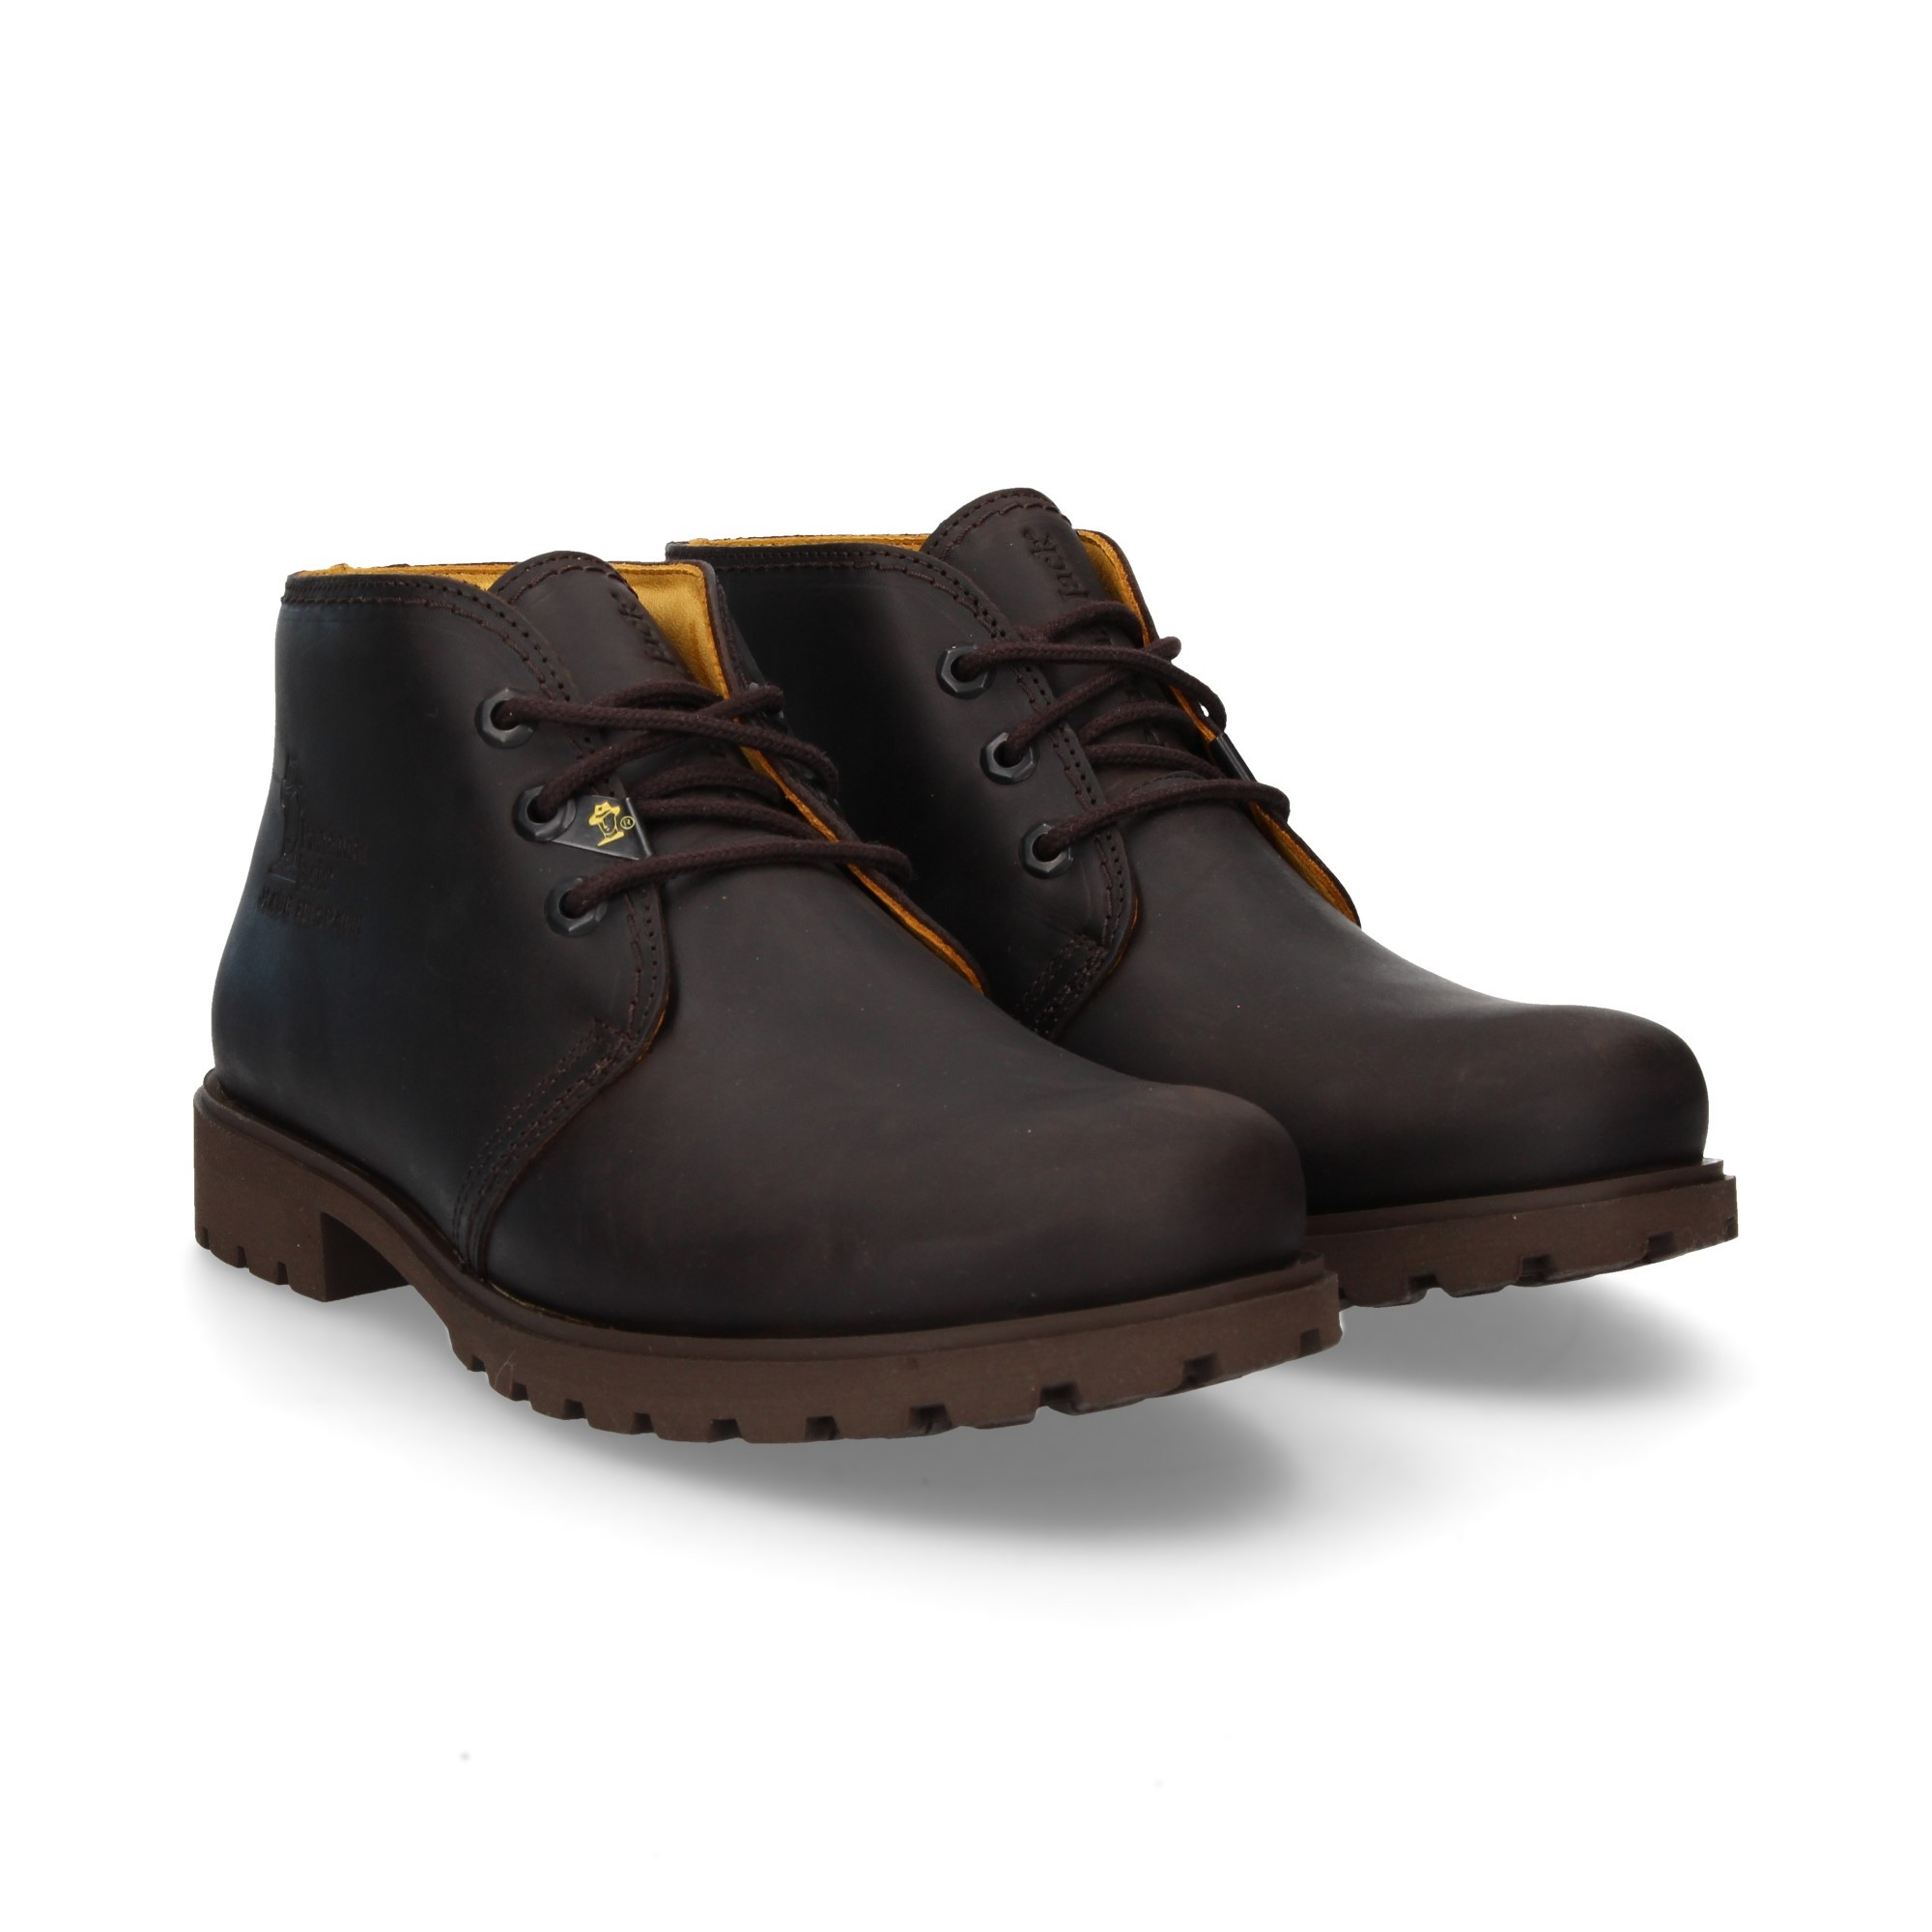 caf62780da3 PANAMA JACK Men s Ankle Boots BOTA PANAM C2 NAPA G.MARRO